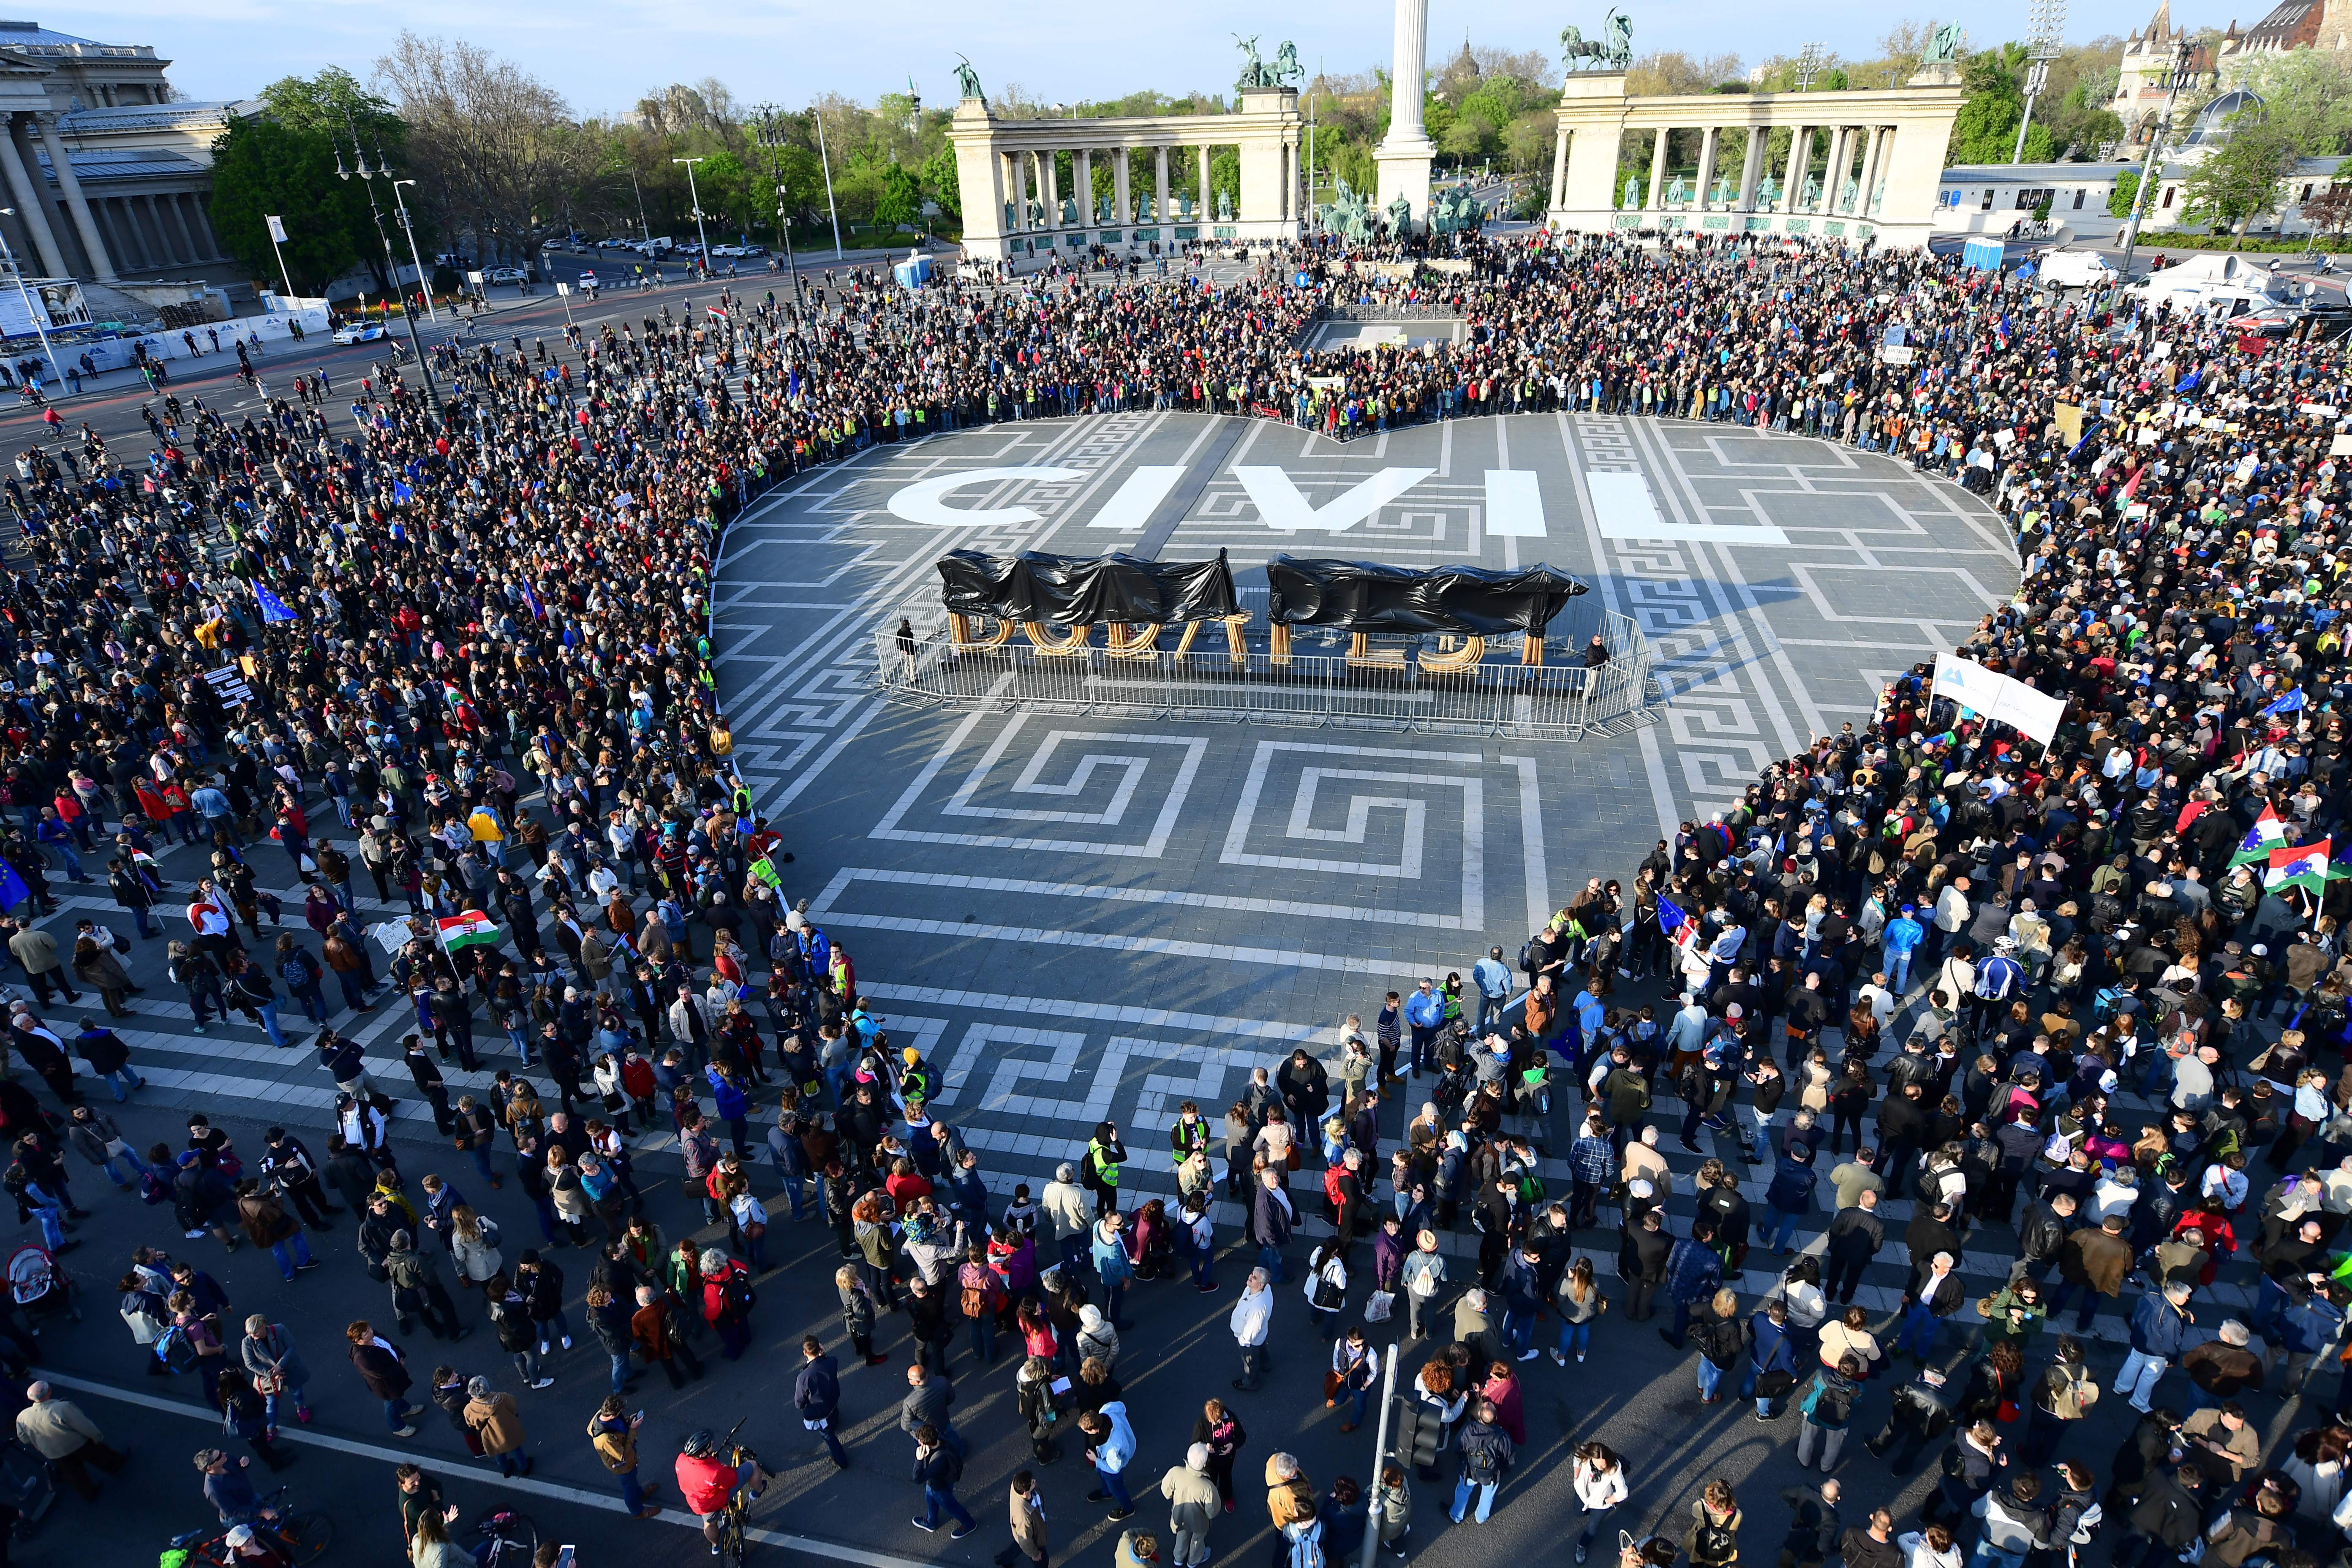 HUNGARY-POLITICS-LAW-EDUCATION-DEMONSTRATION